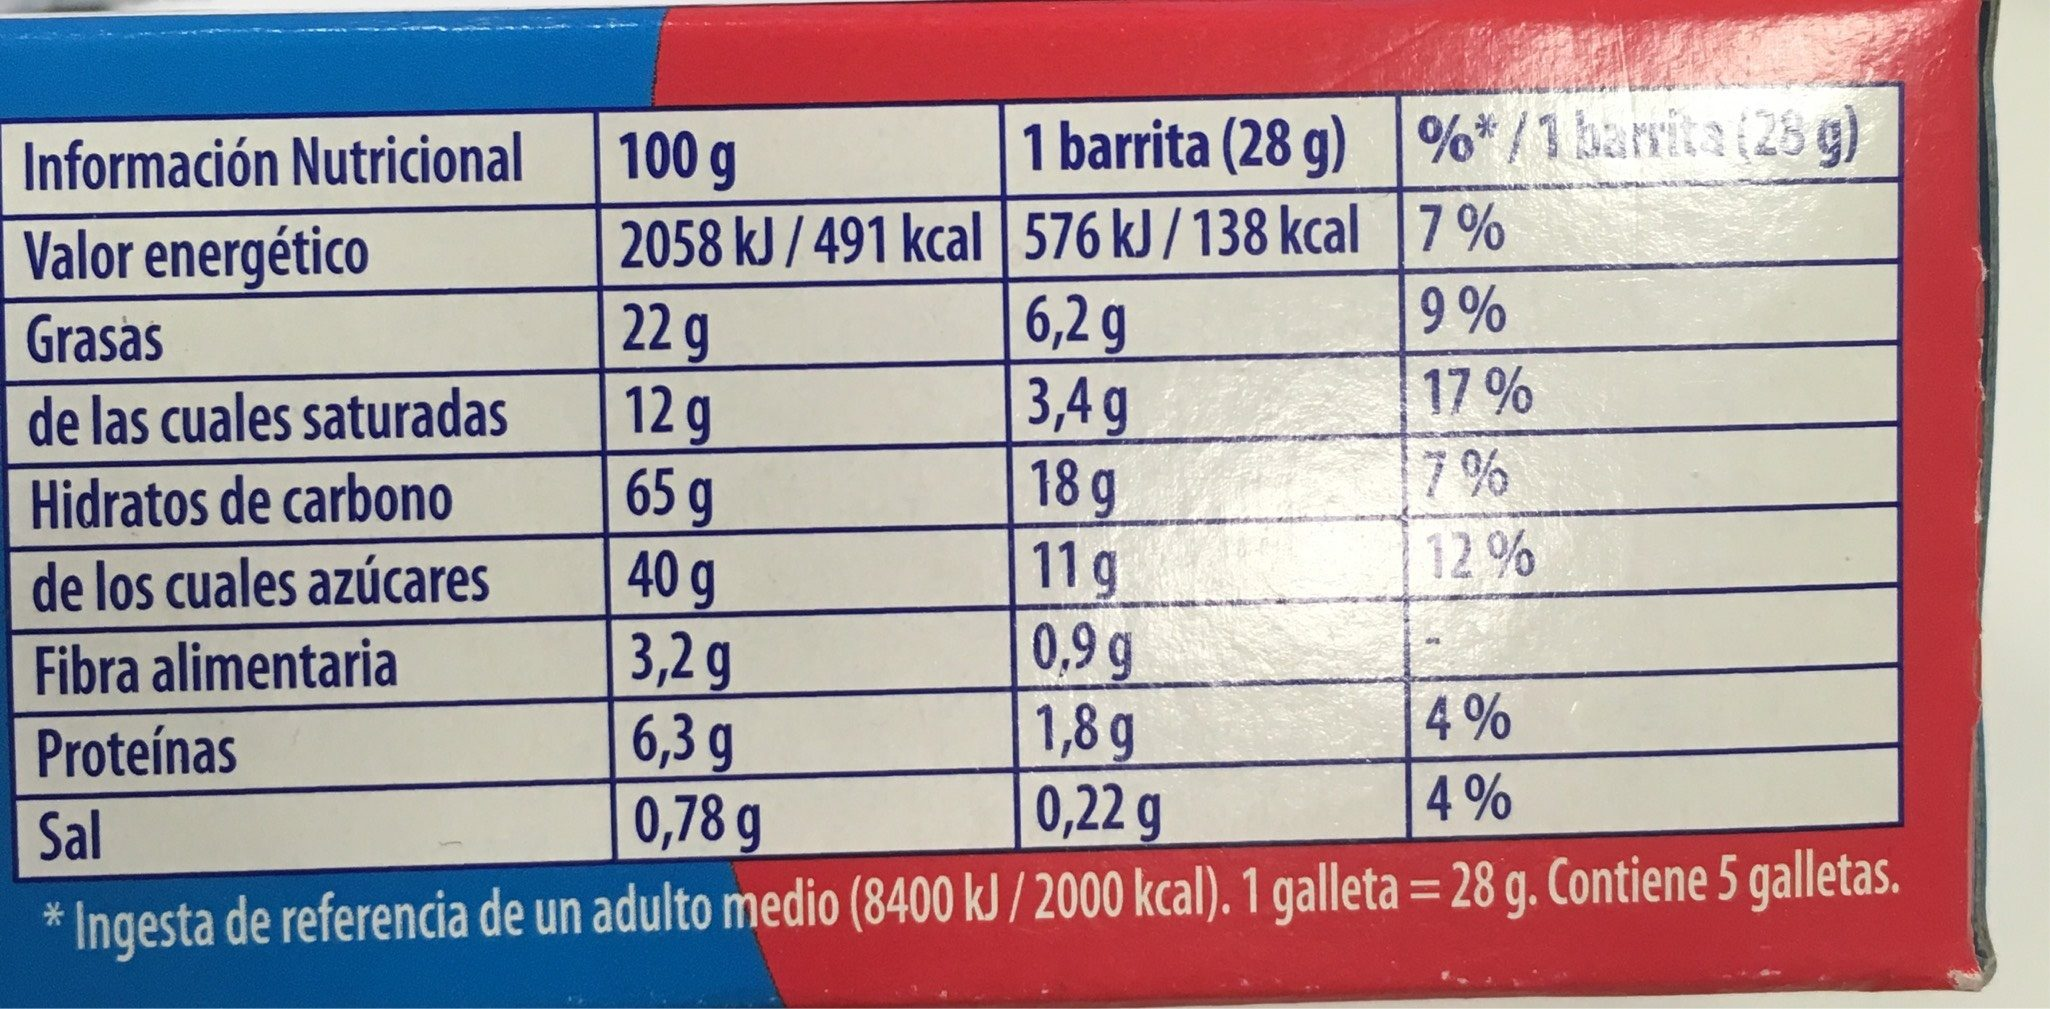 Chips Ahoy! Barritas - Informations nutritionnelles - es